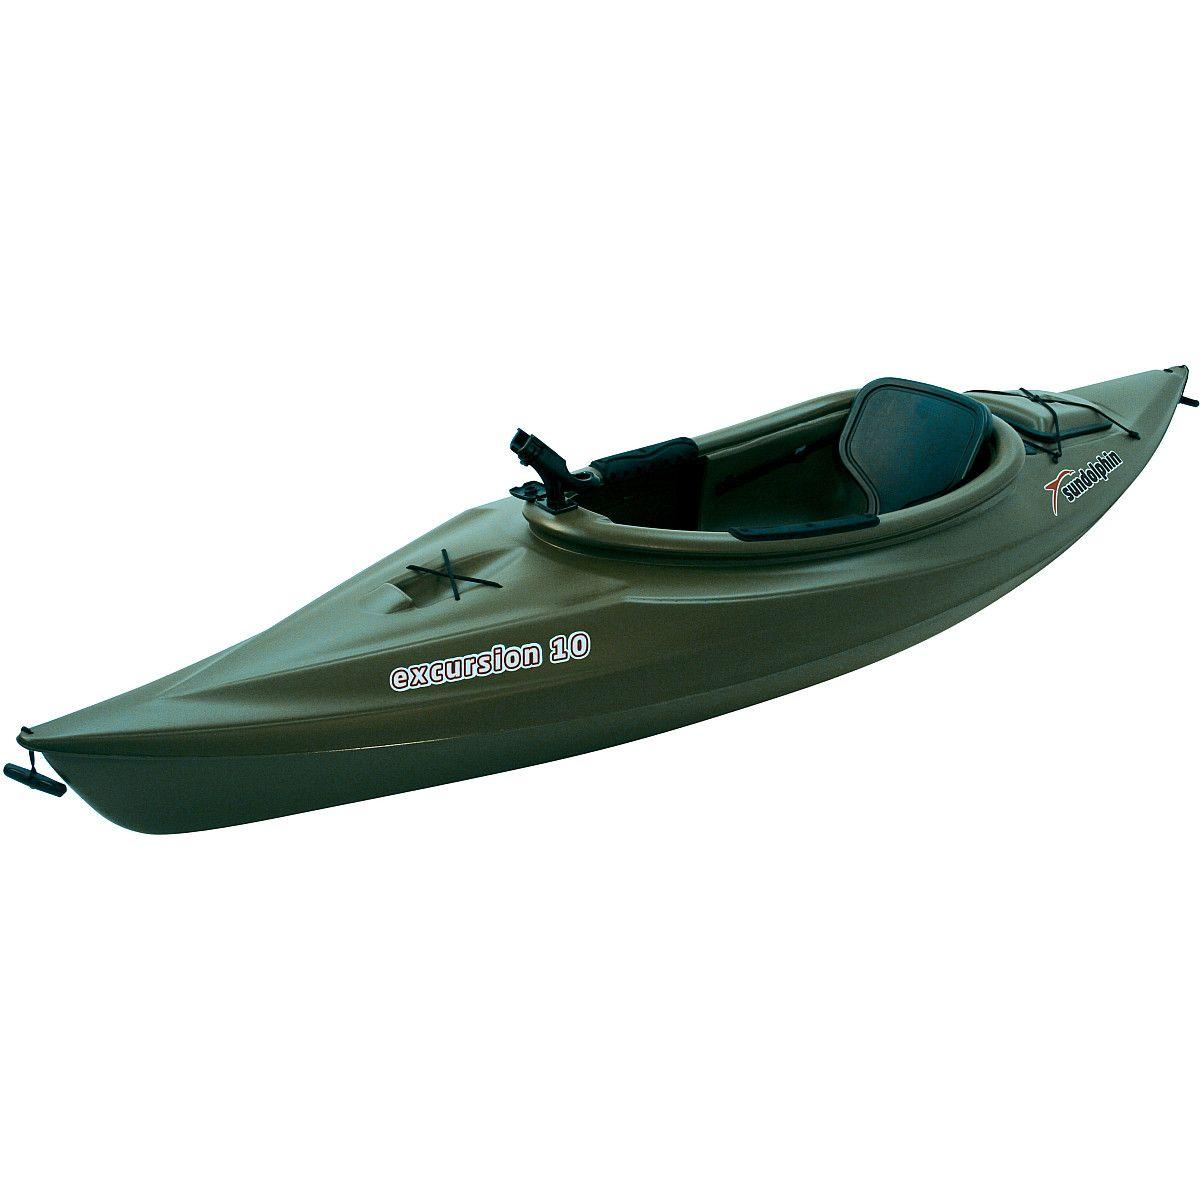 Sun Dolphin Excursion 10' sitin Fishing Kayak Olive